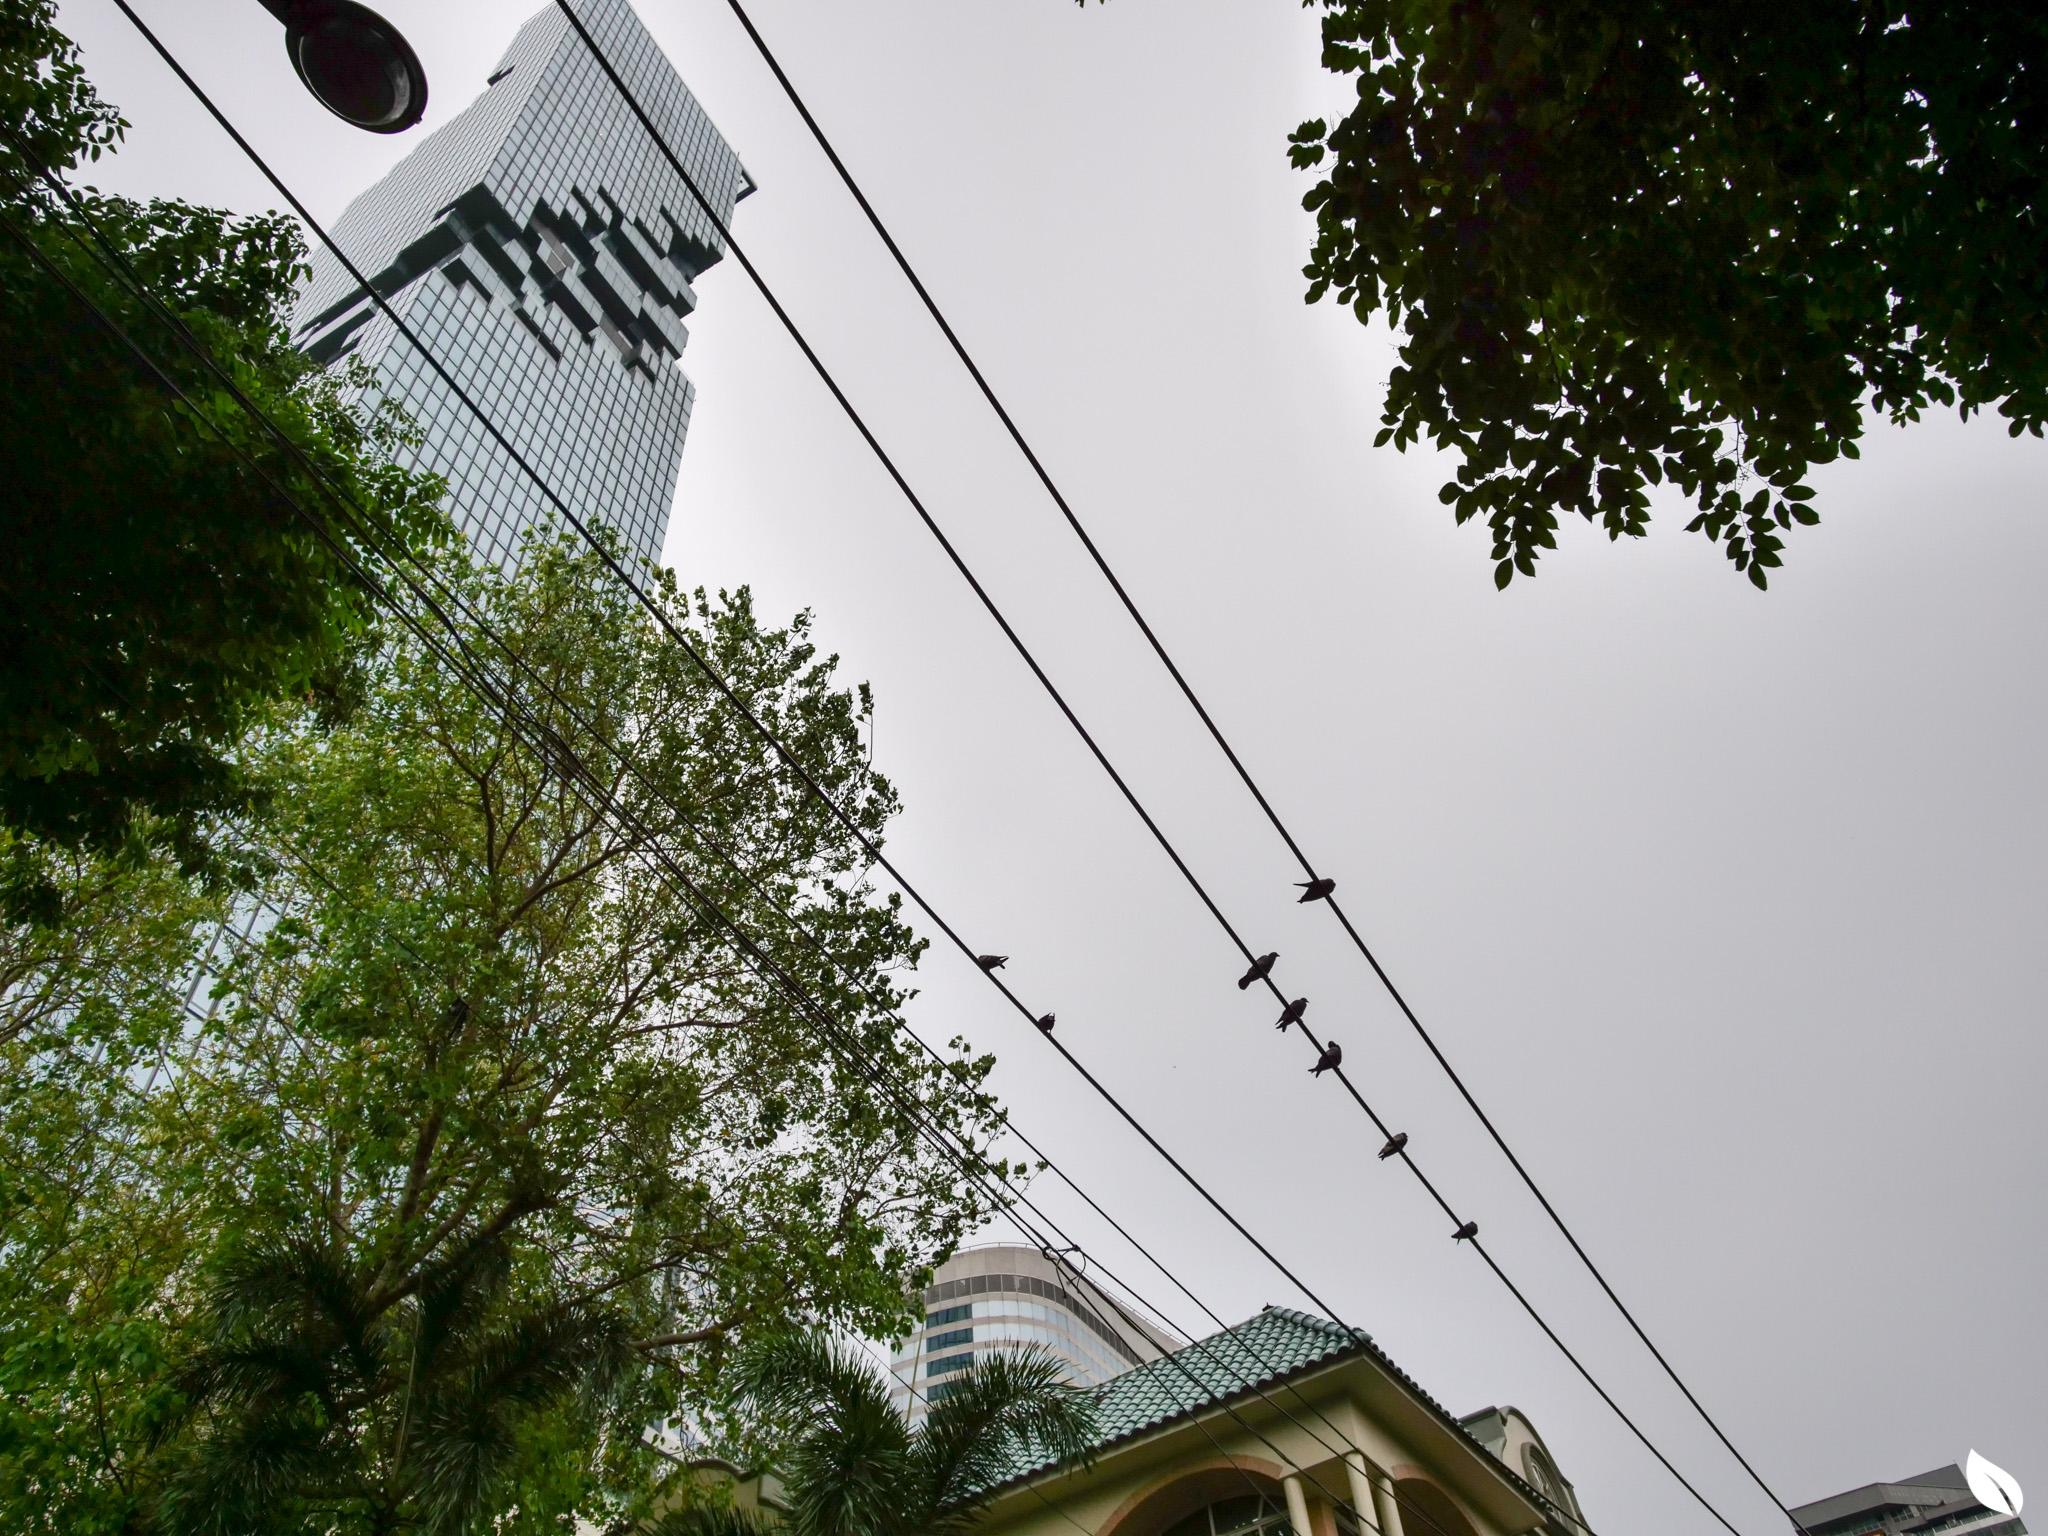 ANIL Sathorn 12 คอนโดสาทรสุดหรูที่ยกระดับคุณภาพชีวิตของผู้พักอาศัย ด้วยมาตรฐาน WELL Building Standard 40 - GRAND UNITY